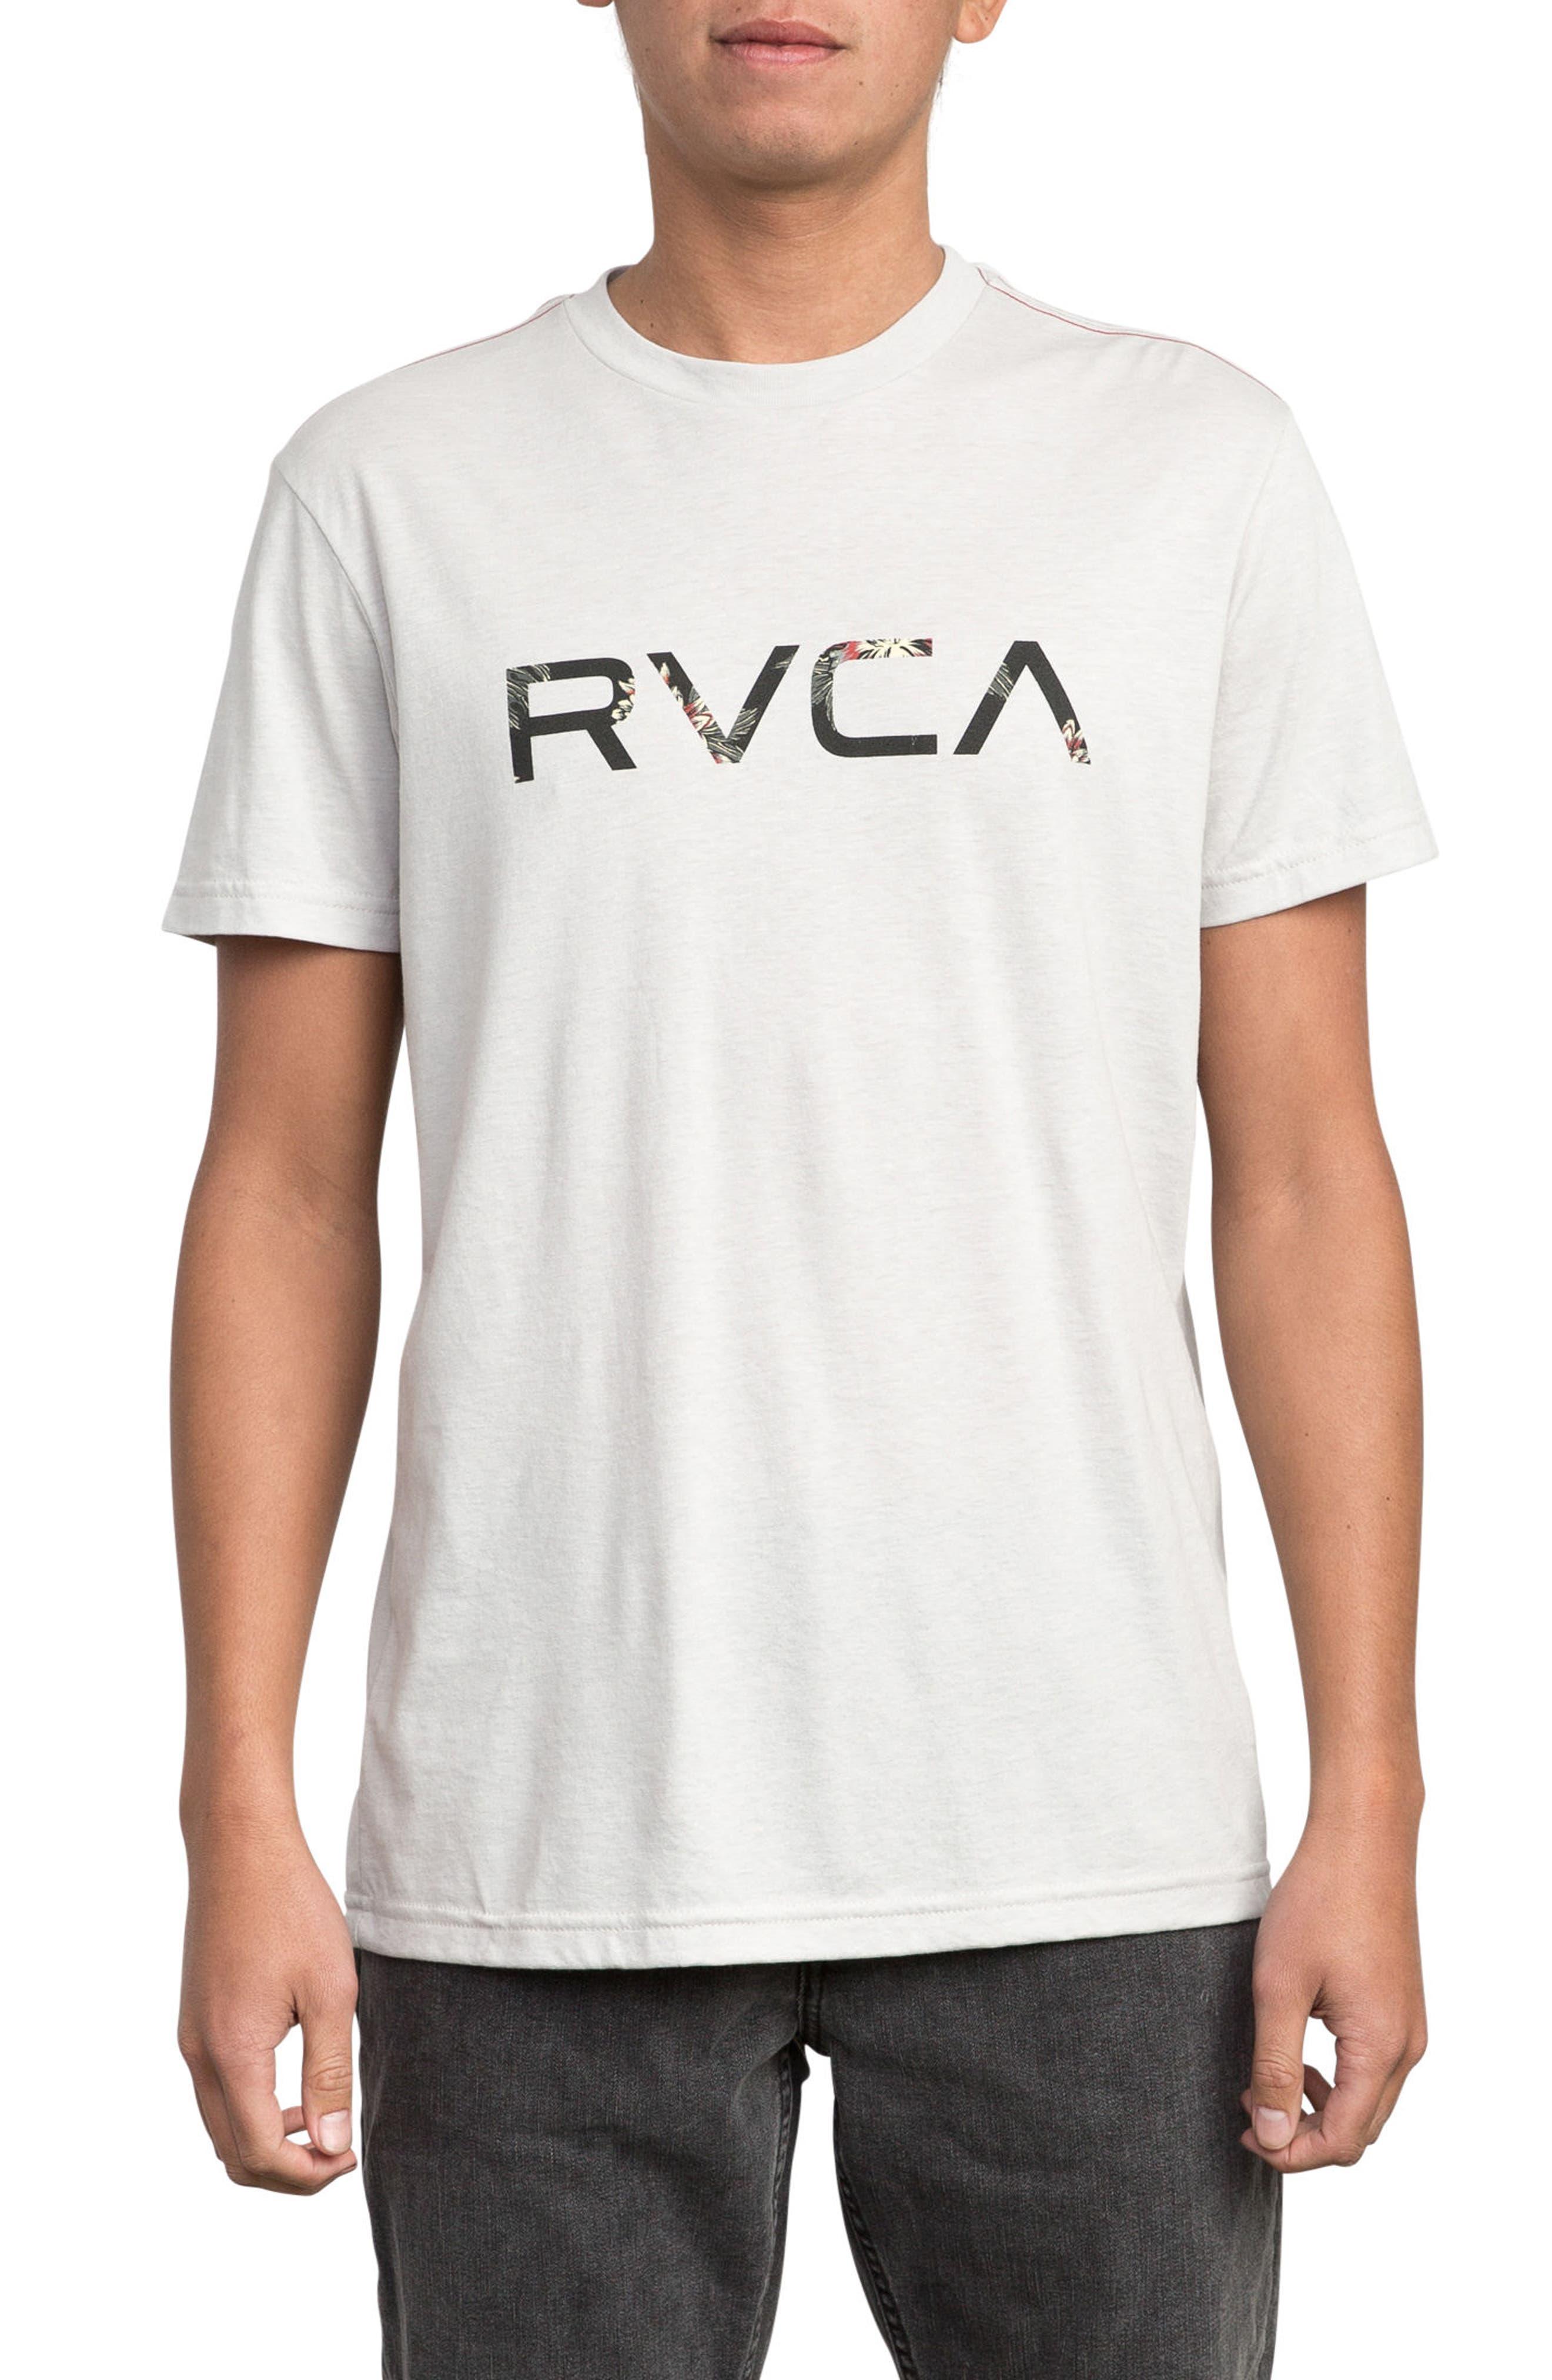 McFloral T-Shirt,                         Main,                         color, WARM GREY